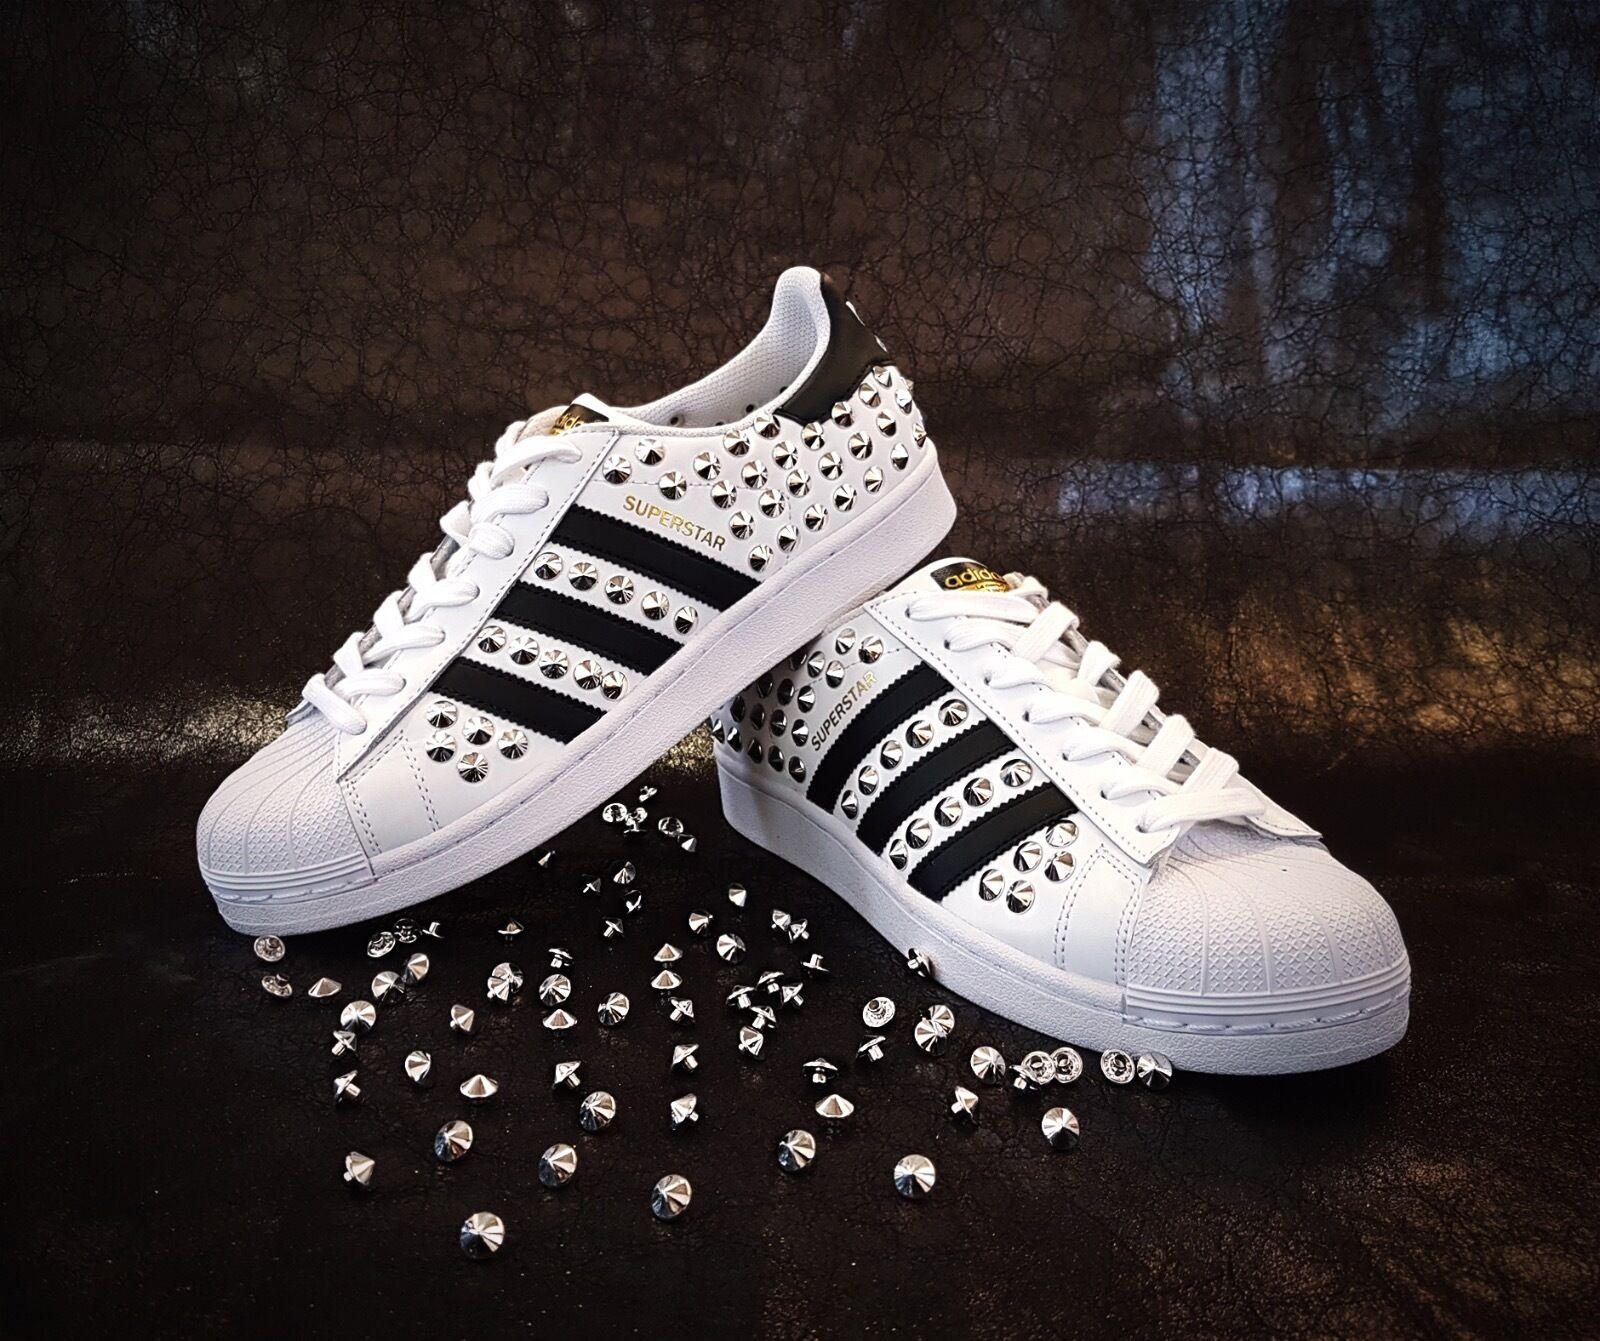 Adidas superstar con borchie borchie borchie argento cfd4b5